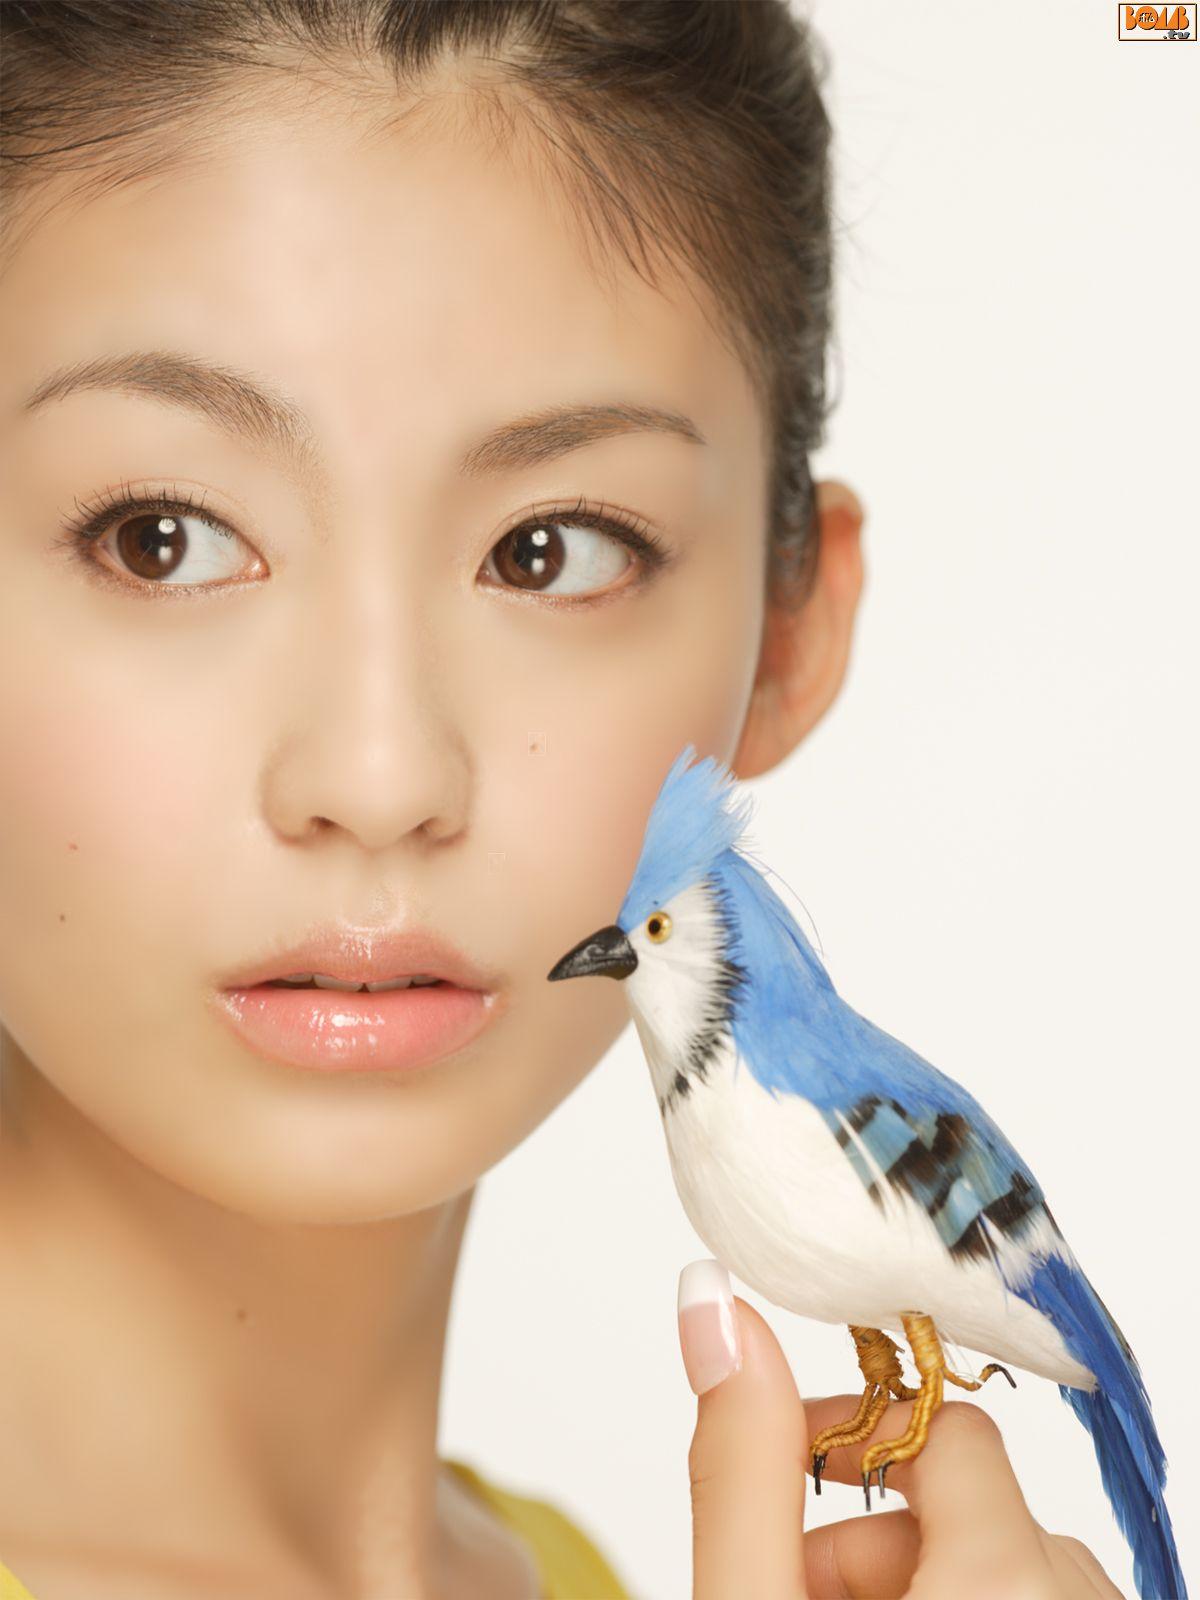 Nose piercing for big nose  Wallpaper  Art  Pinterest  Wallpaper Pretty girls and Asian